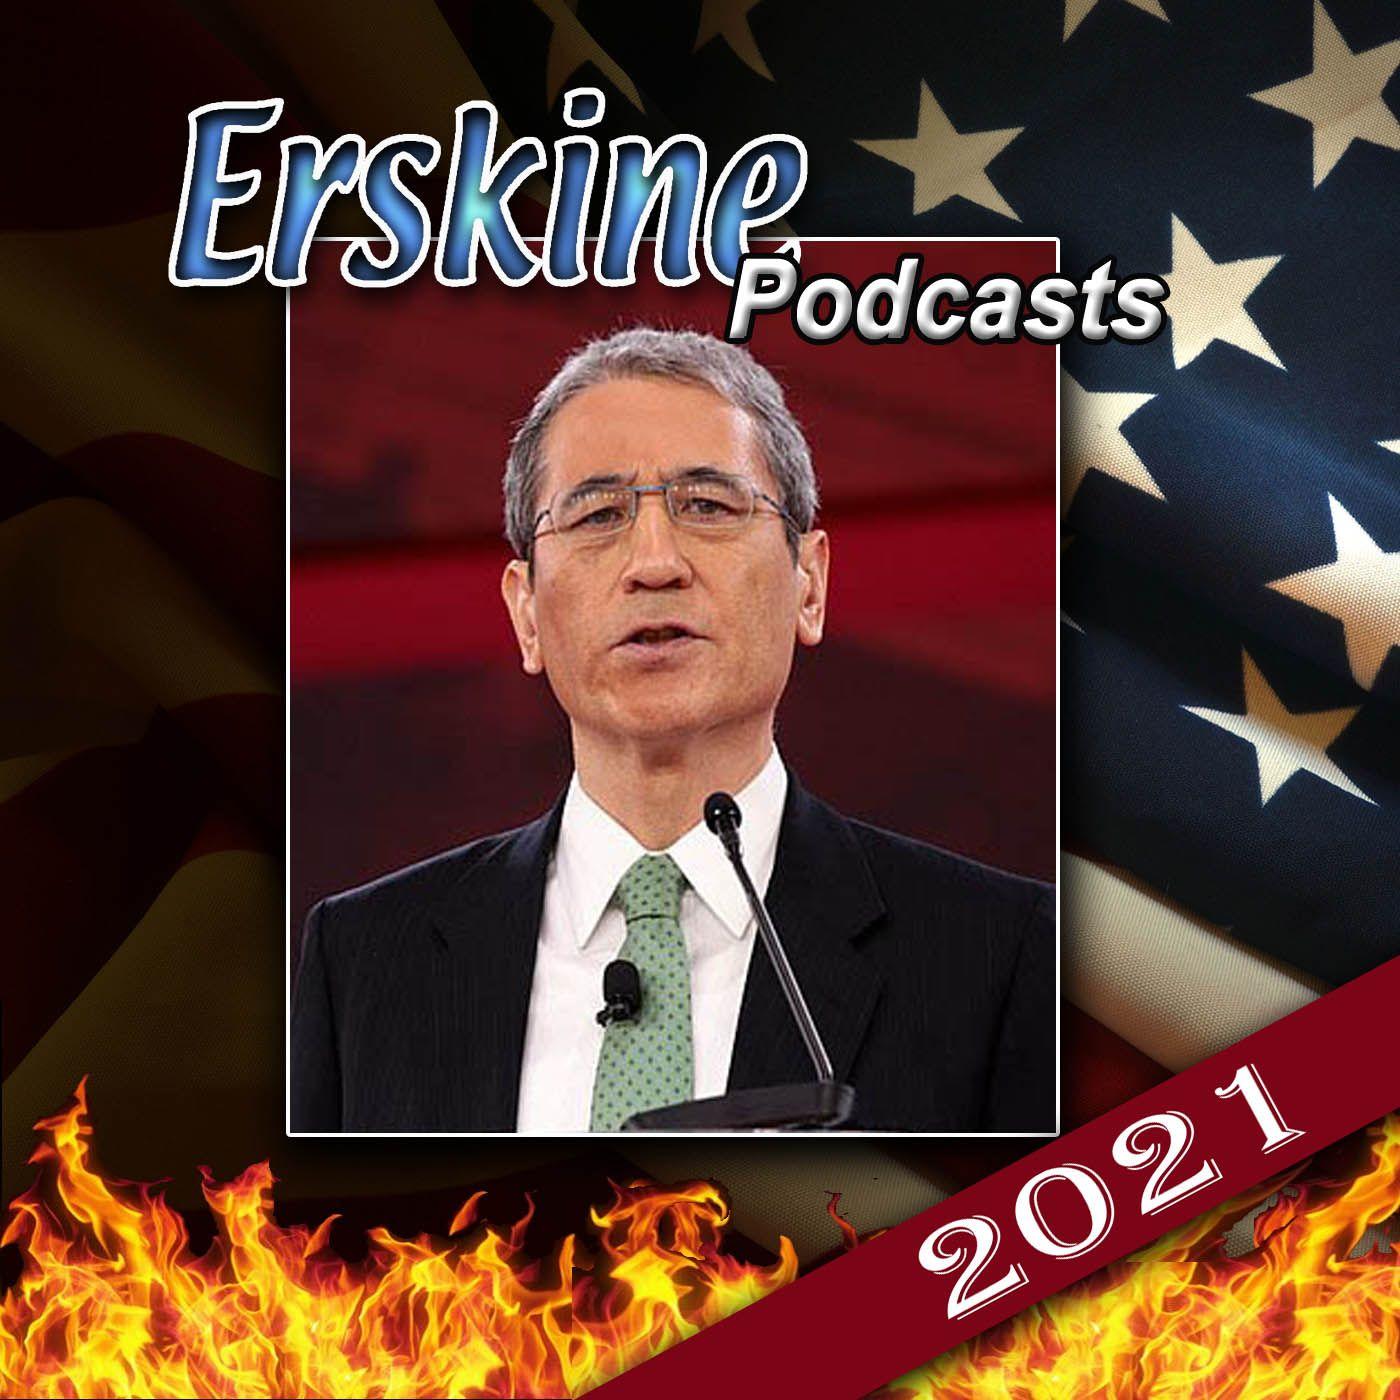 Gordon Chang - China's subversive influences on America (ep#1-2-21)